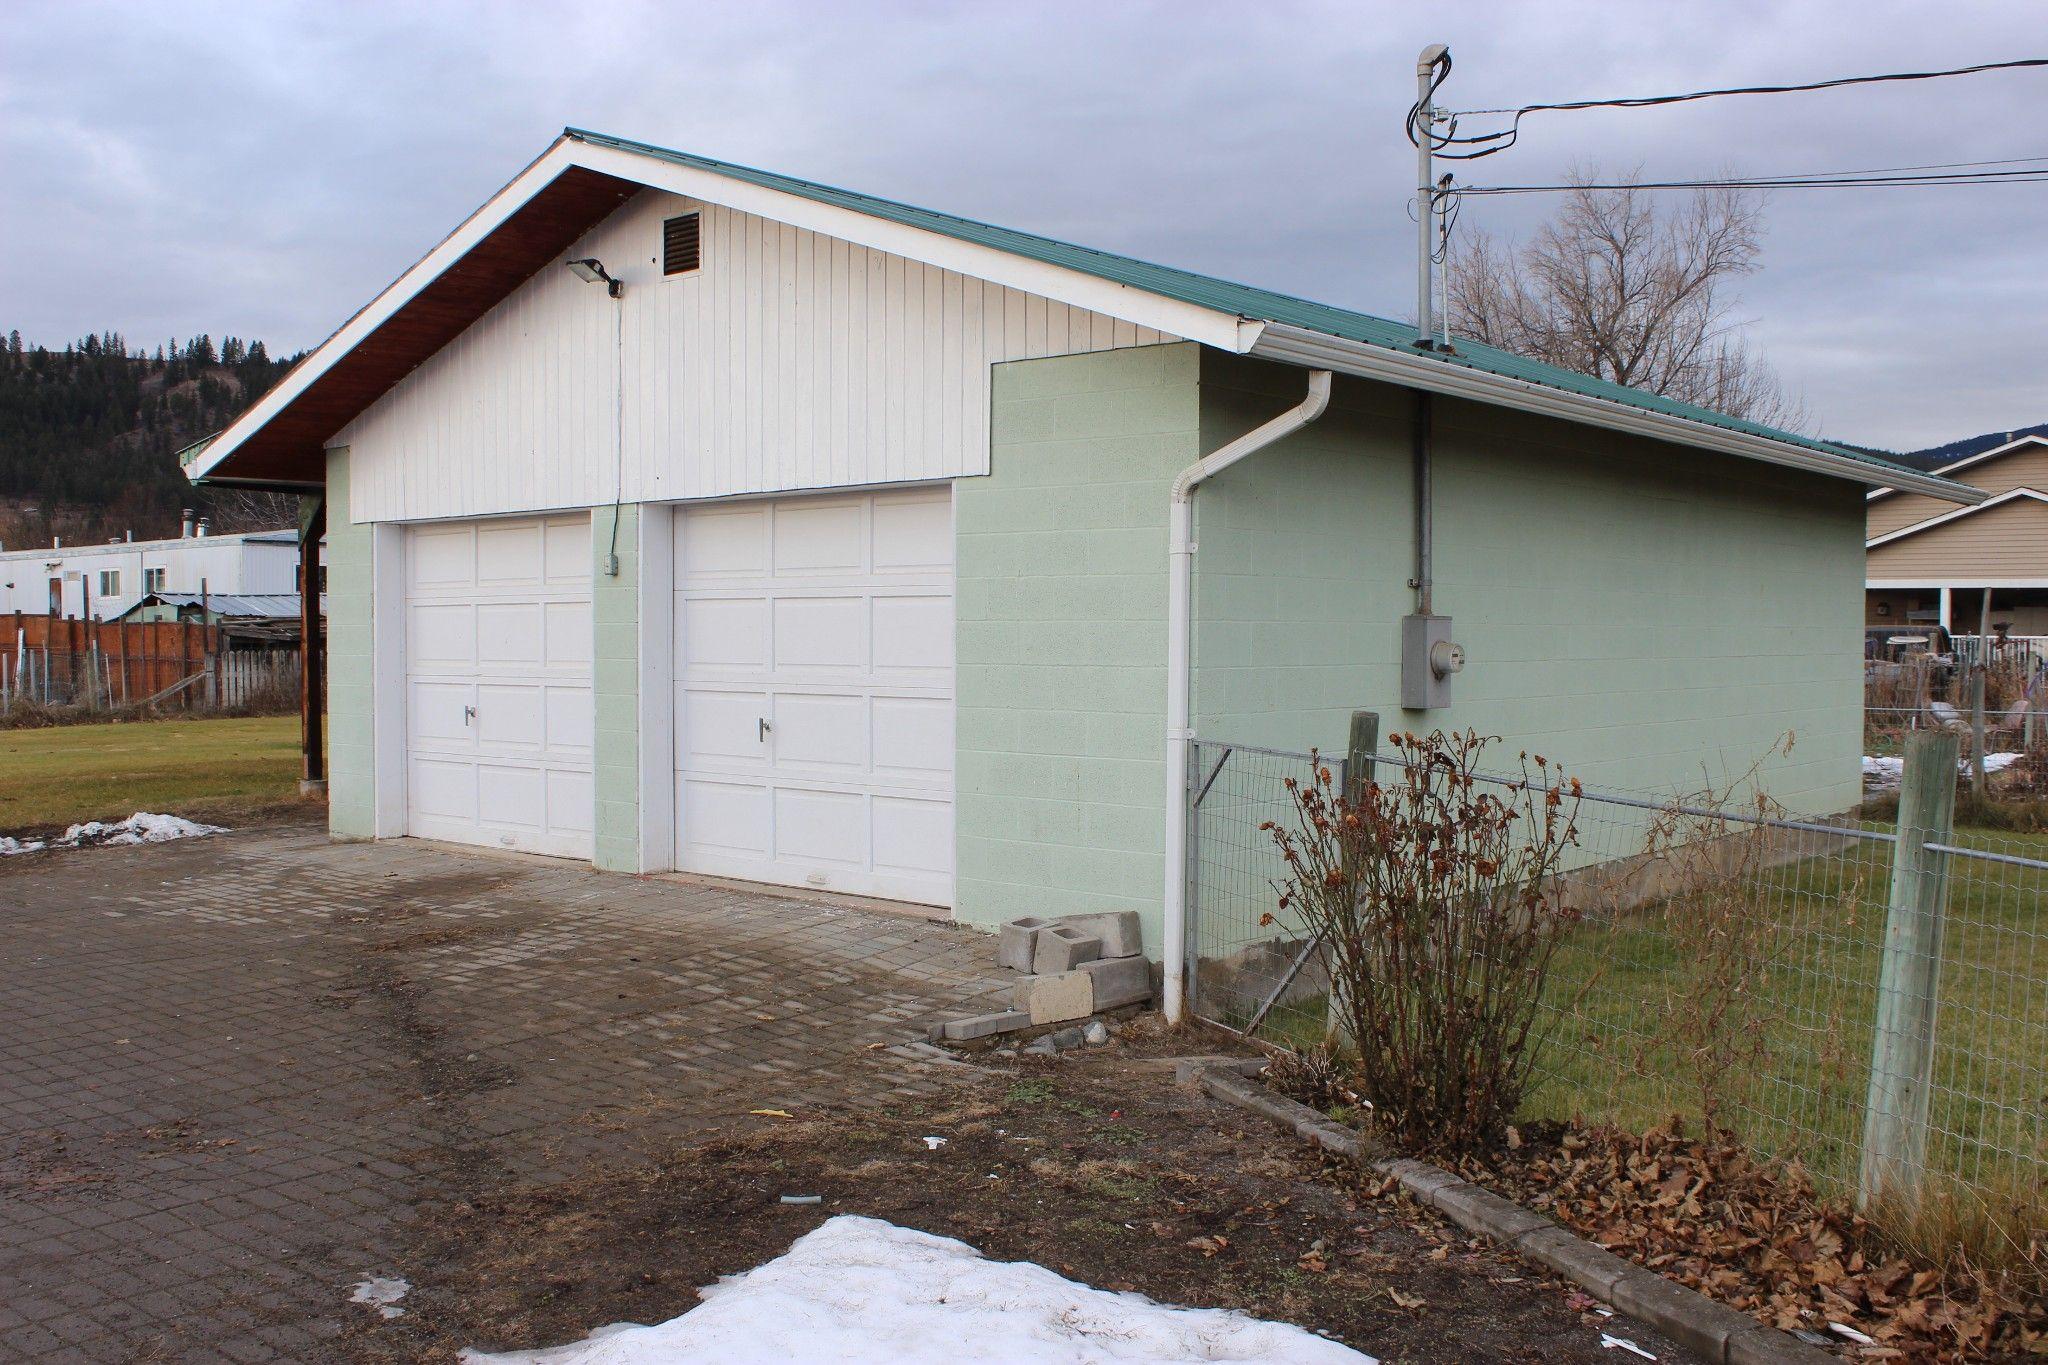 Photo 15: Photos: 6725 Heffley Road in Kamloops: Heffley House for sale : MLS®# 160007